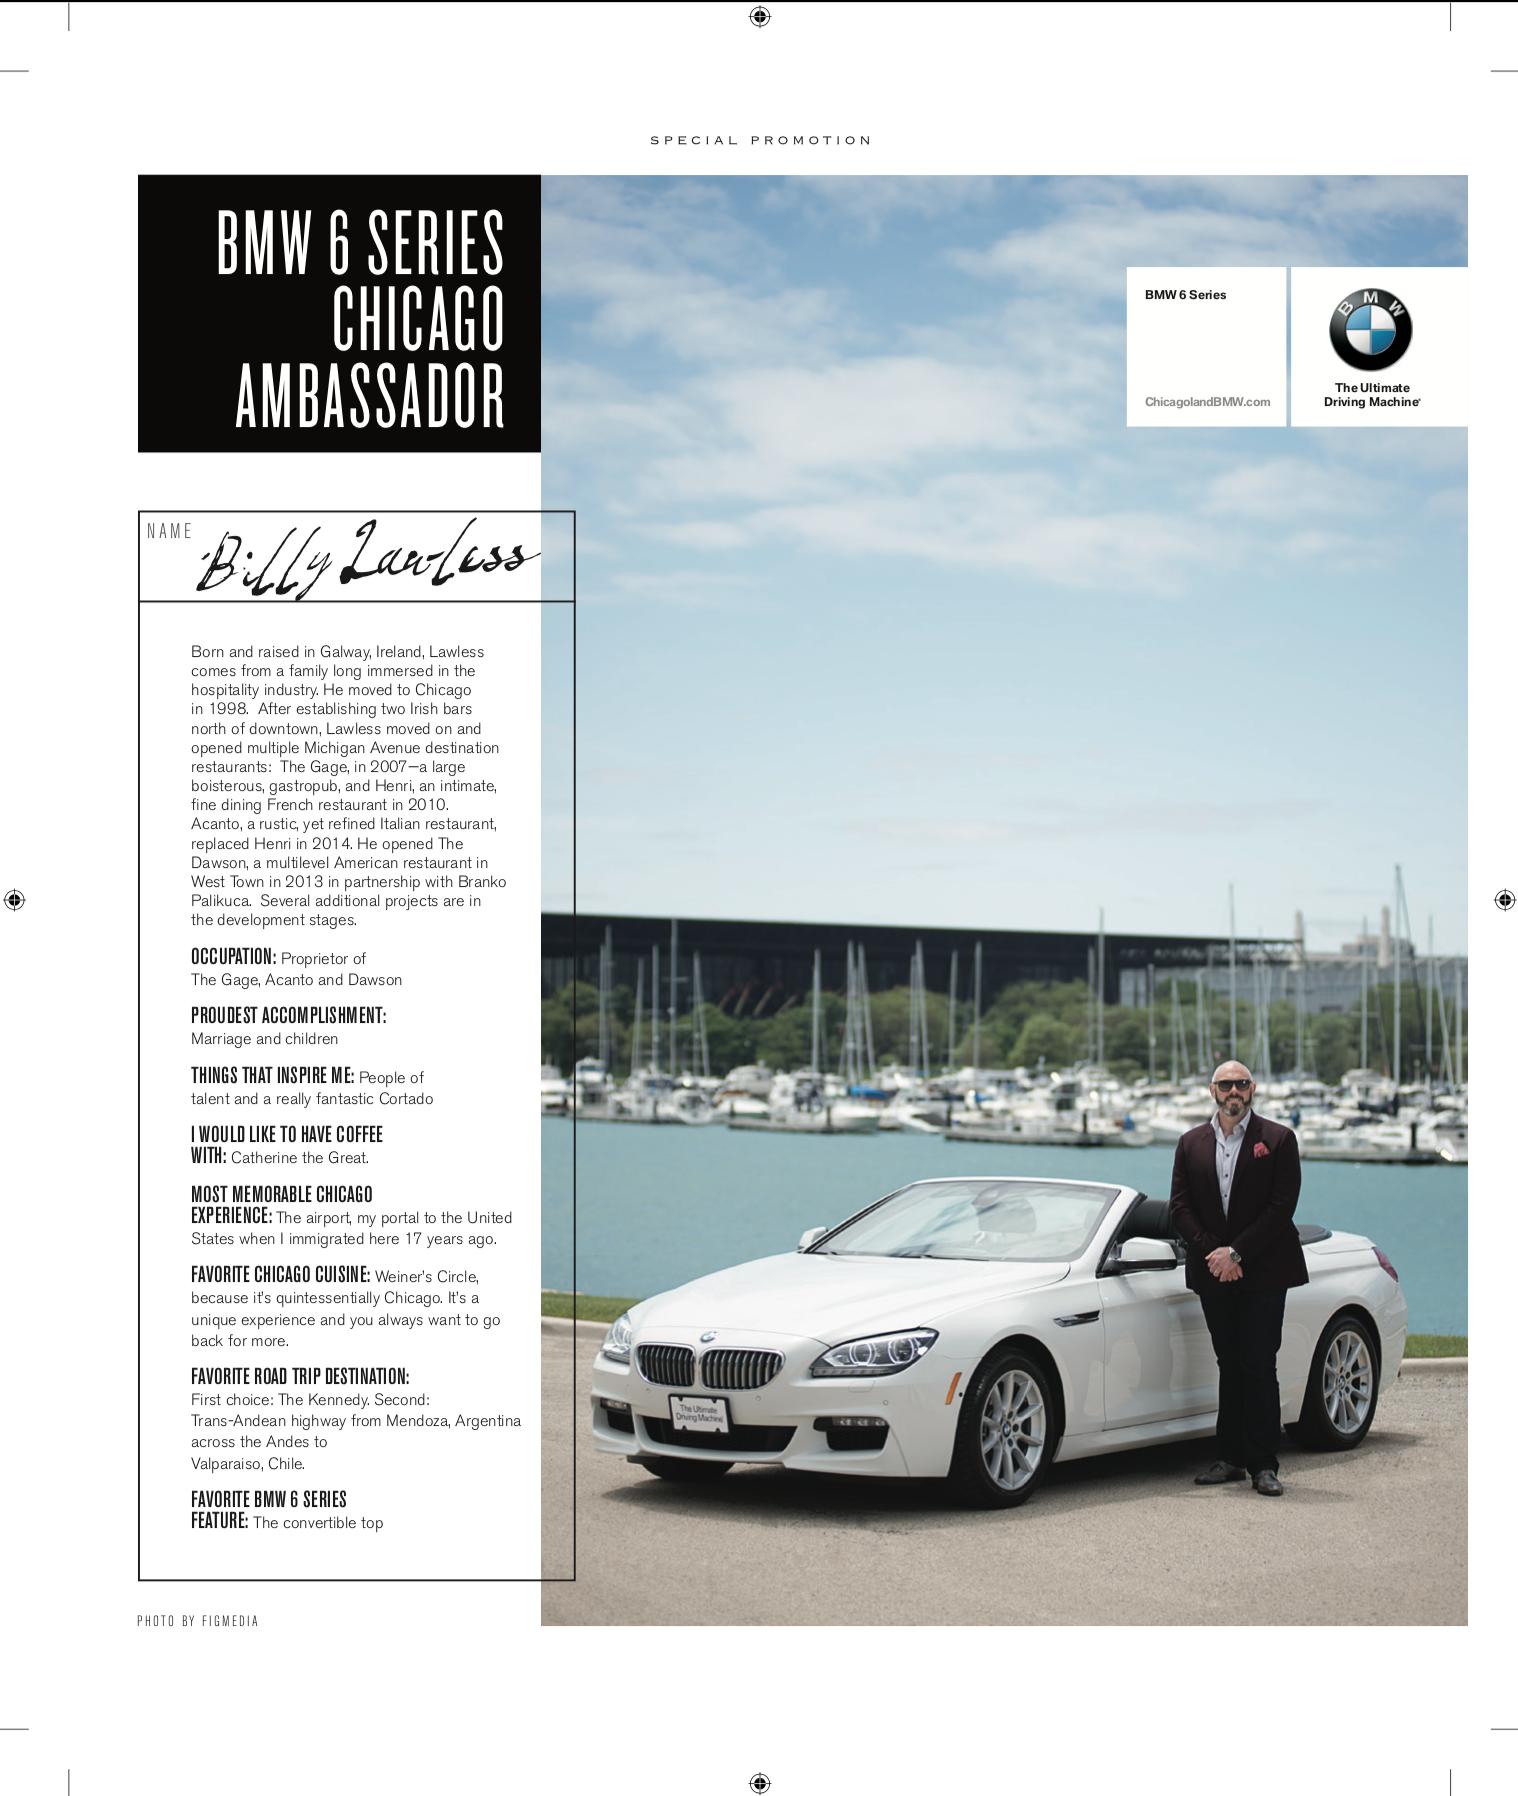 Billy-Lawless-Chicago-BMW.jpg